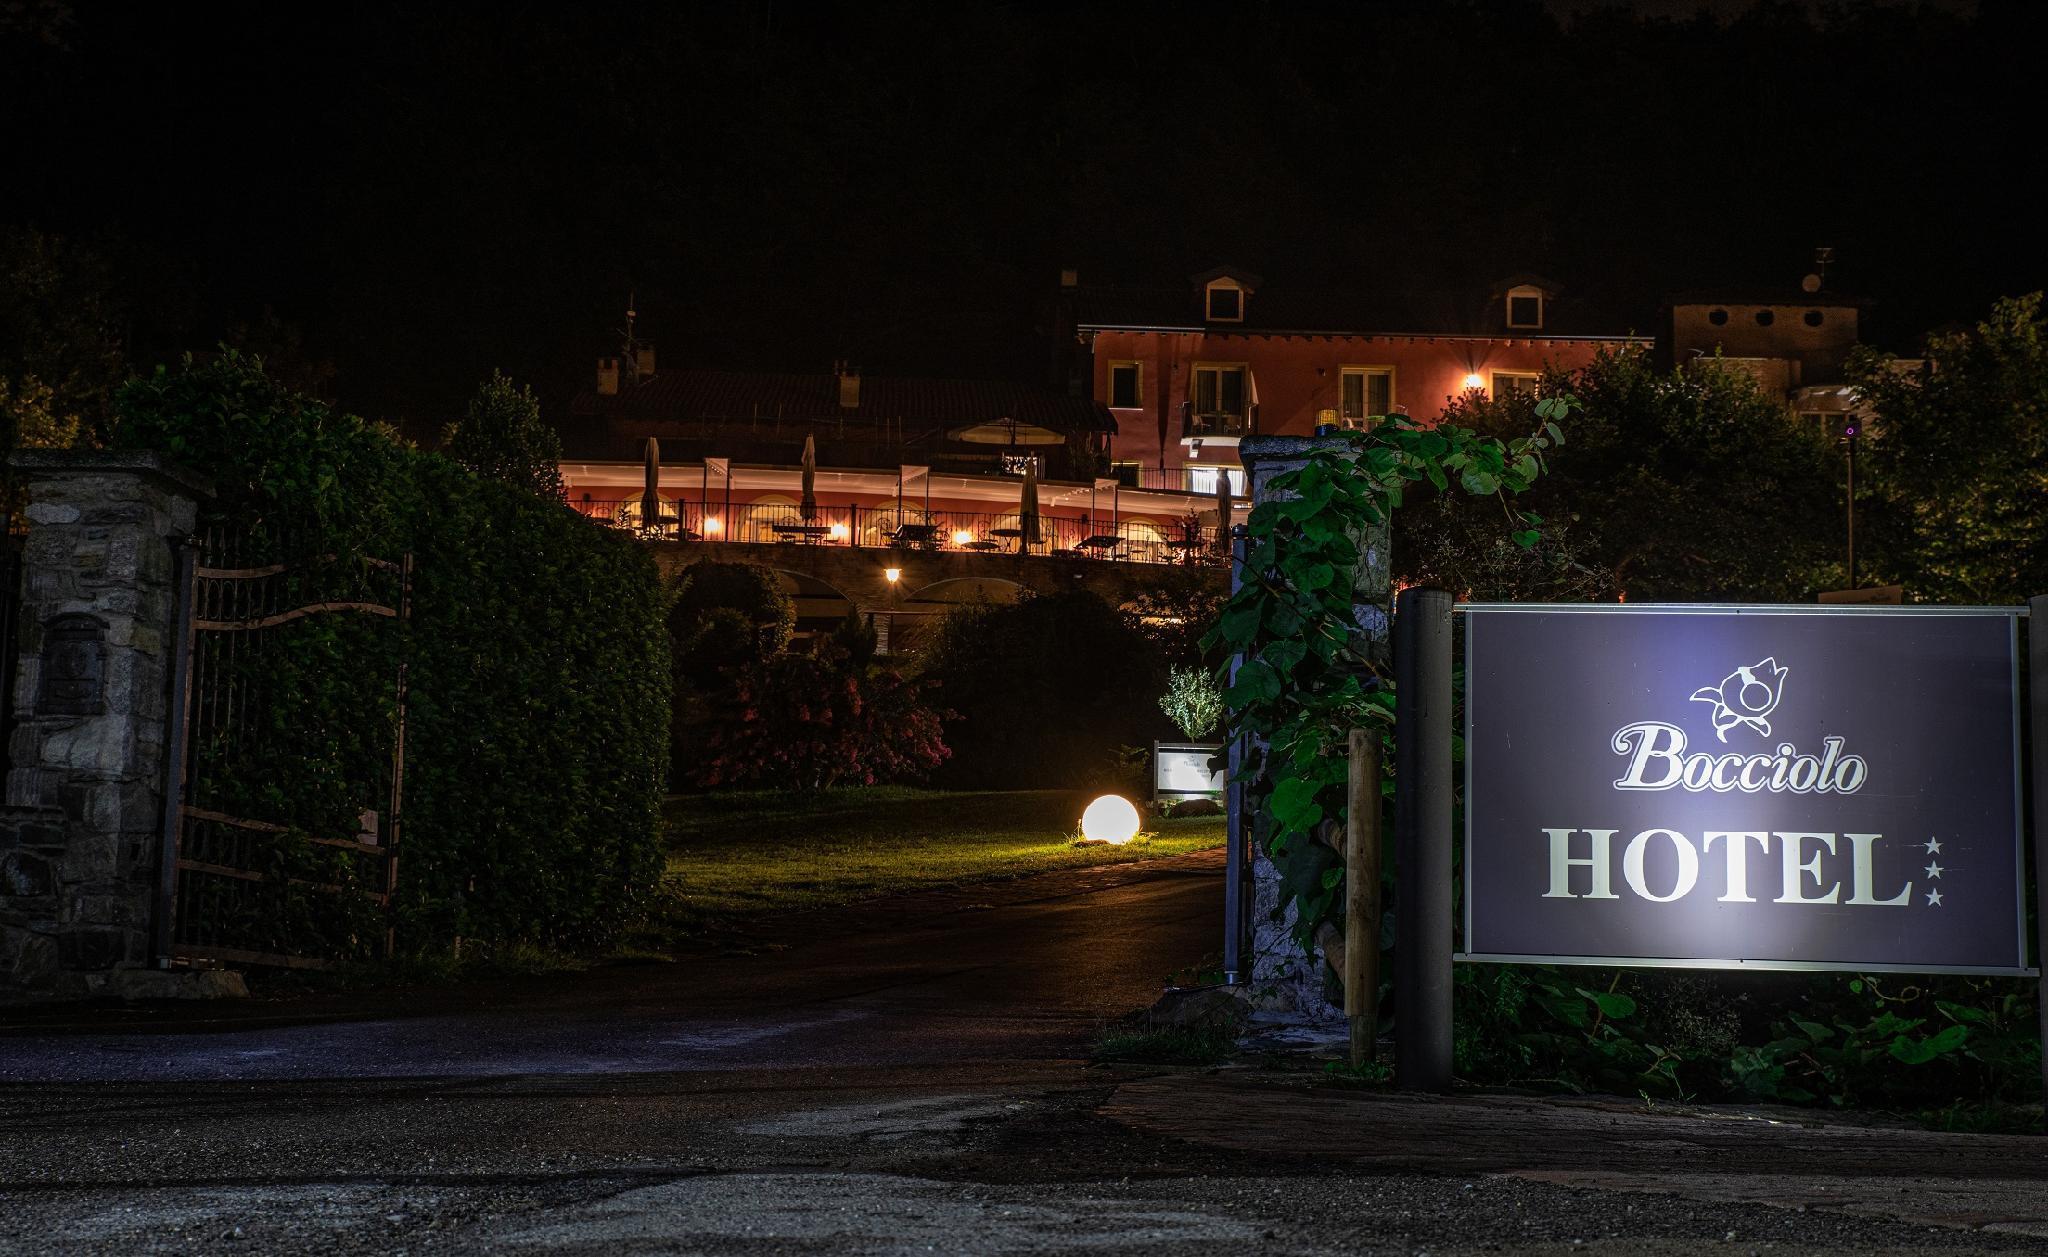 HOTEL Bocciolo